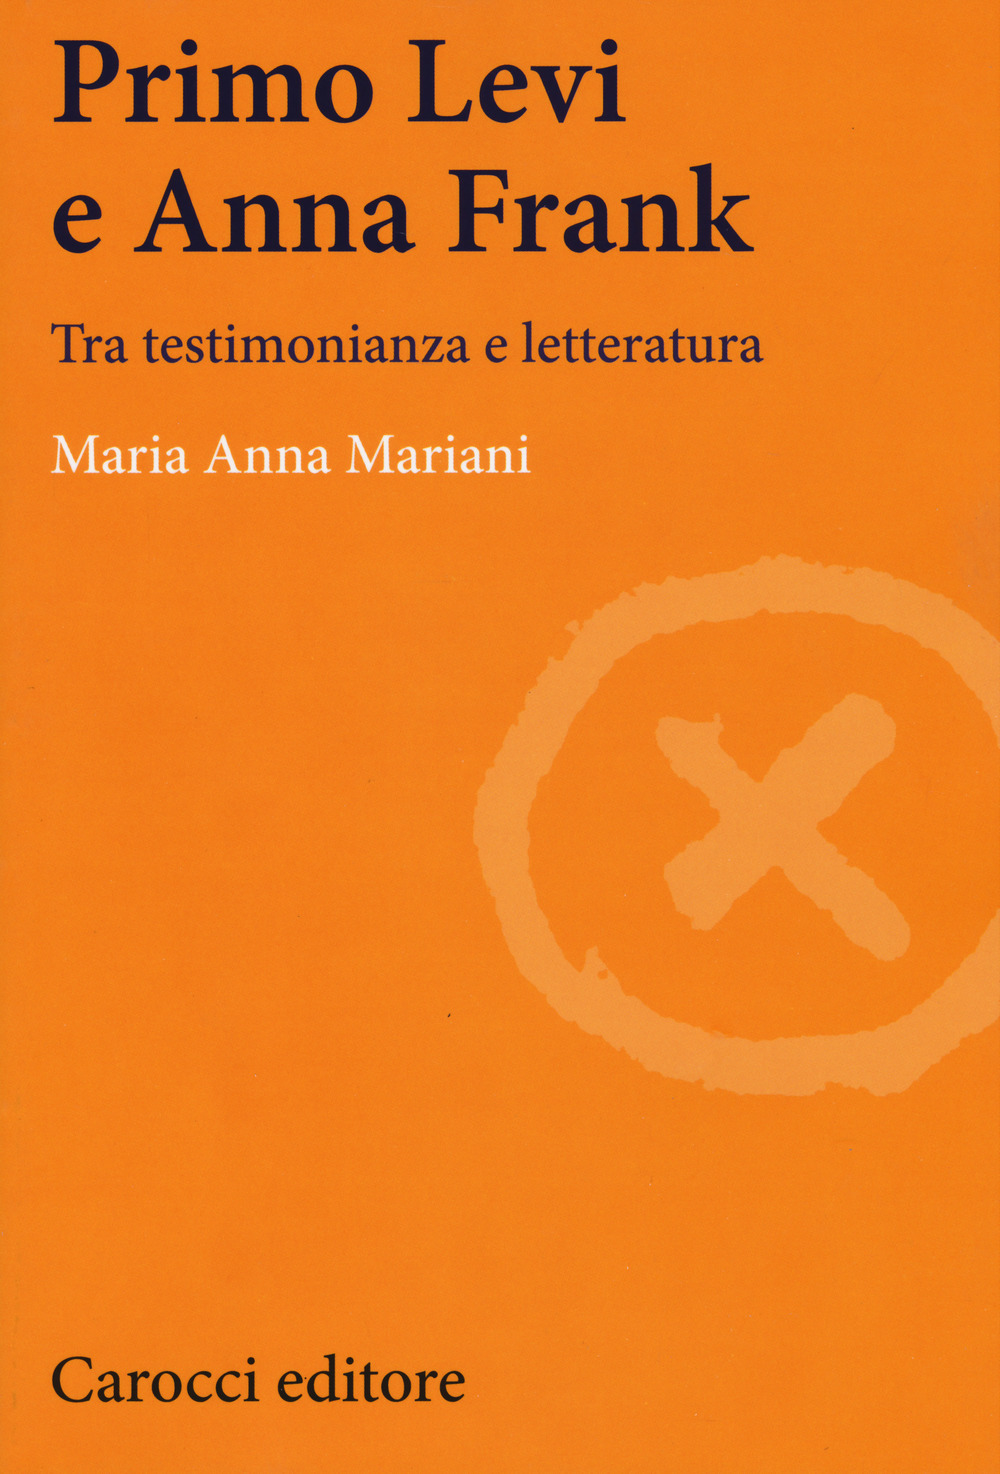 Maria Anna Mariani